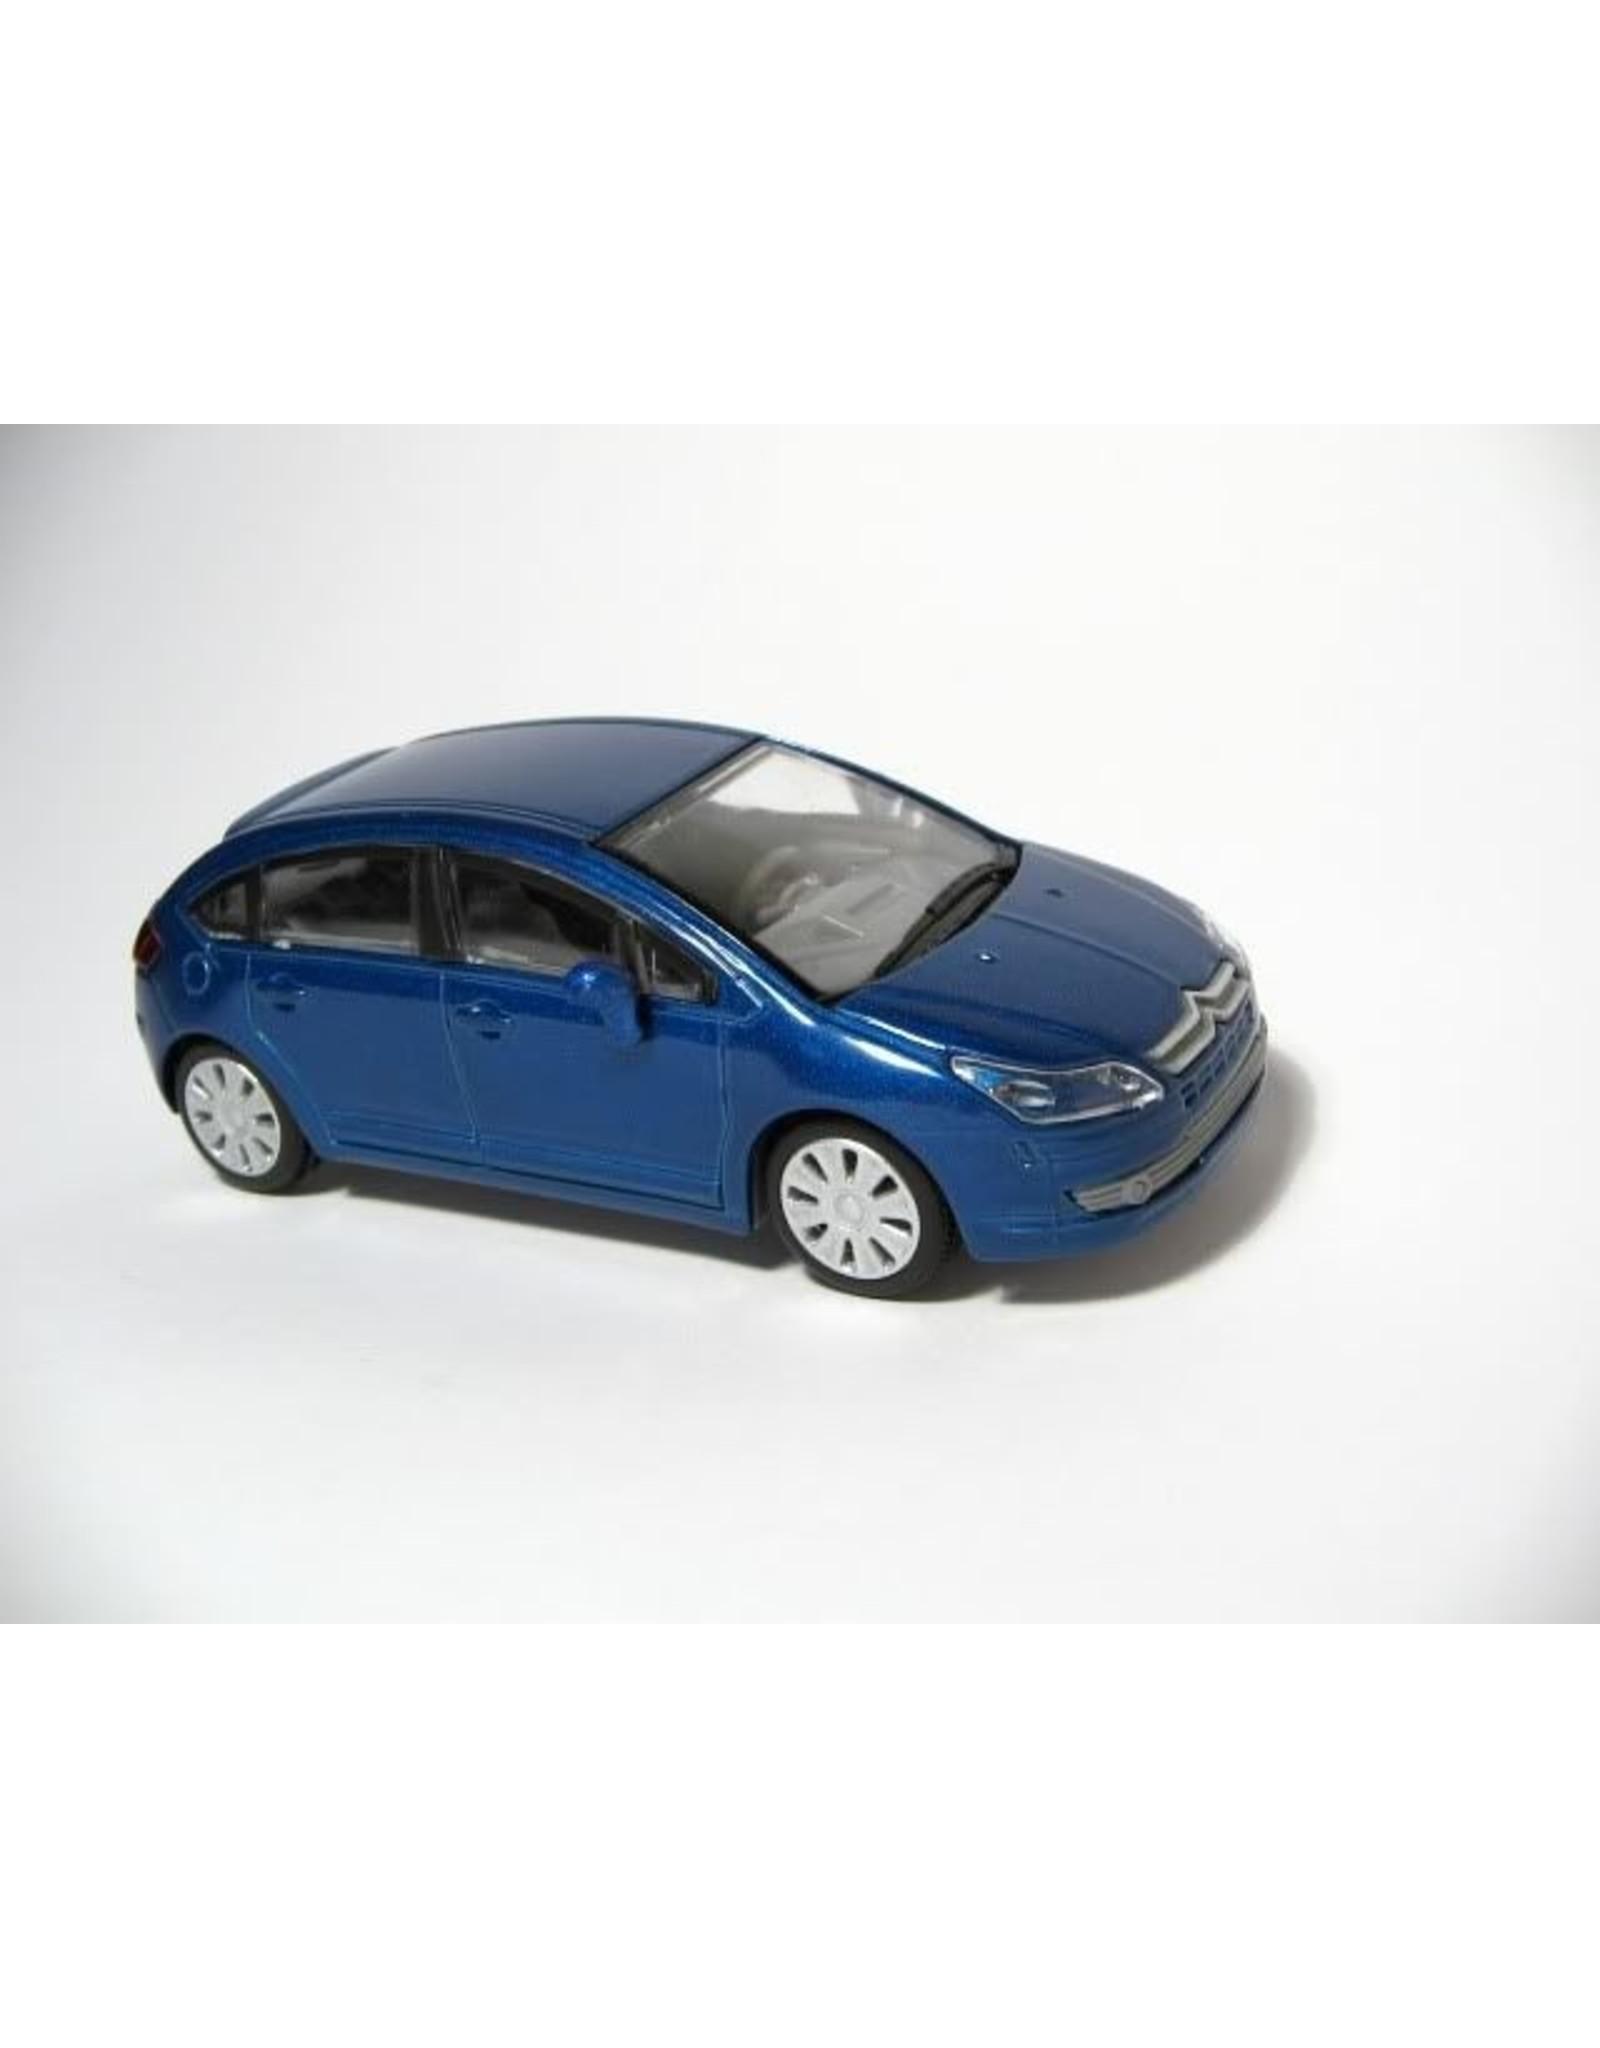 Citroën CITROËN C4(blue metallic)or copper brown metallic